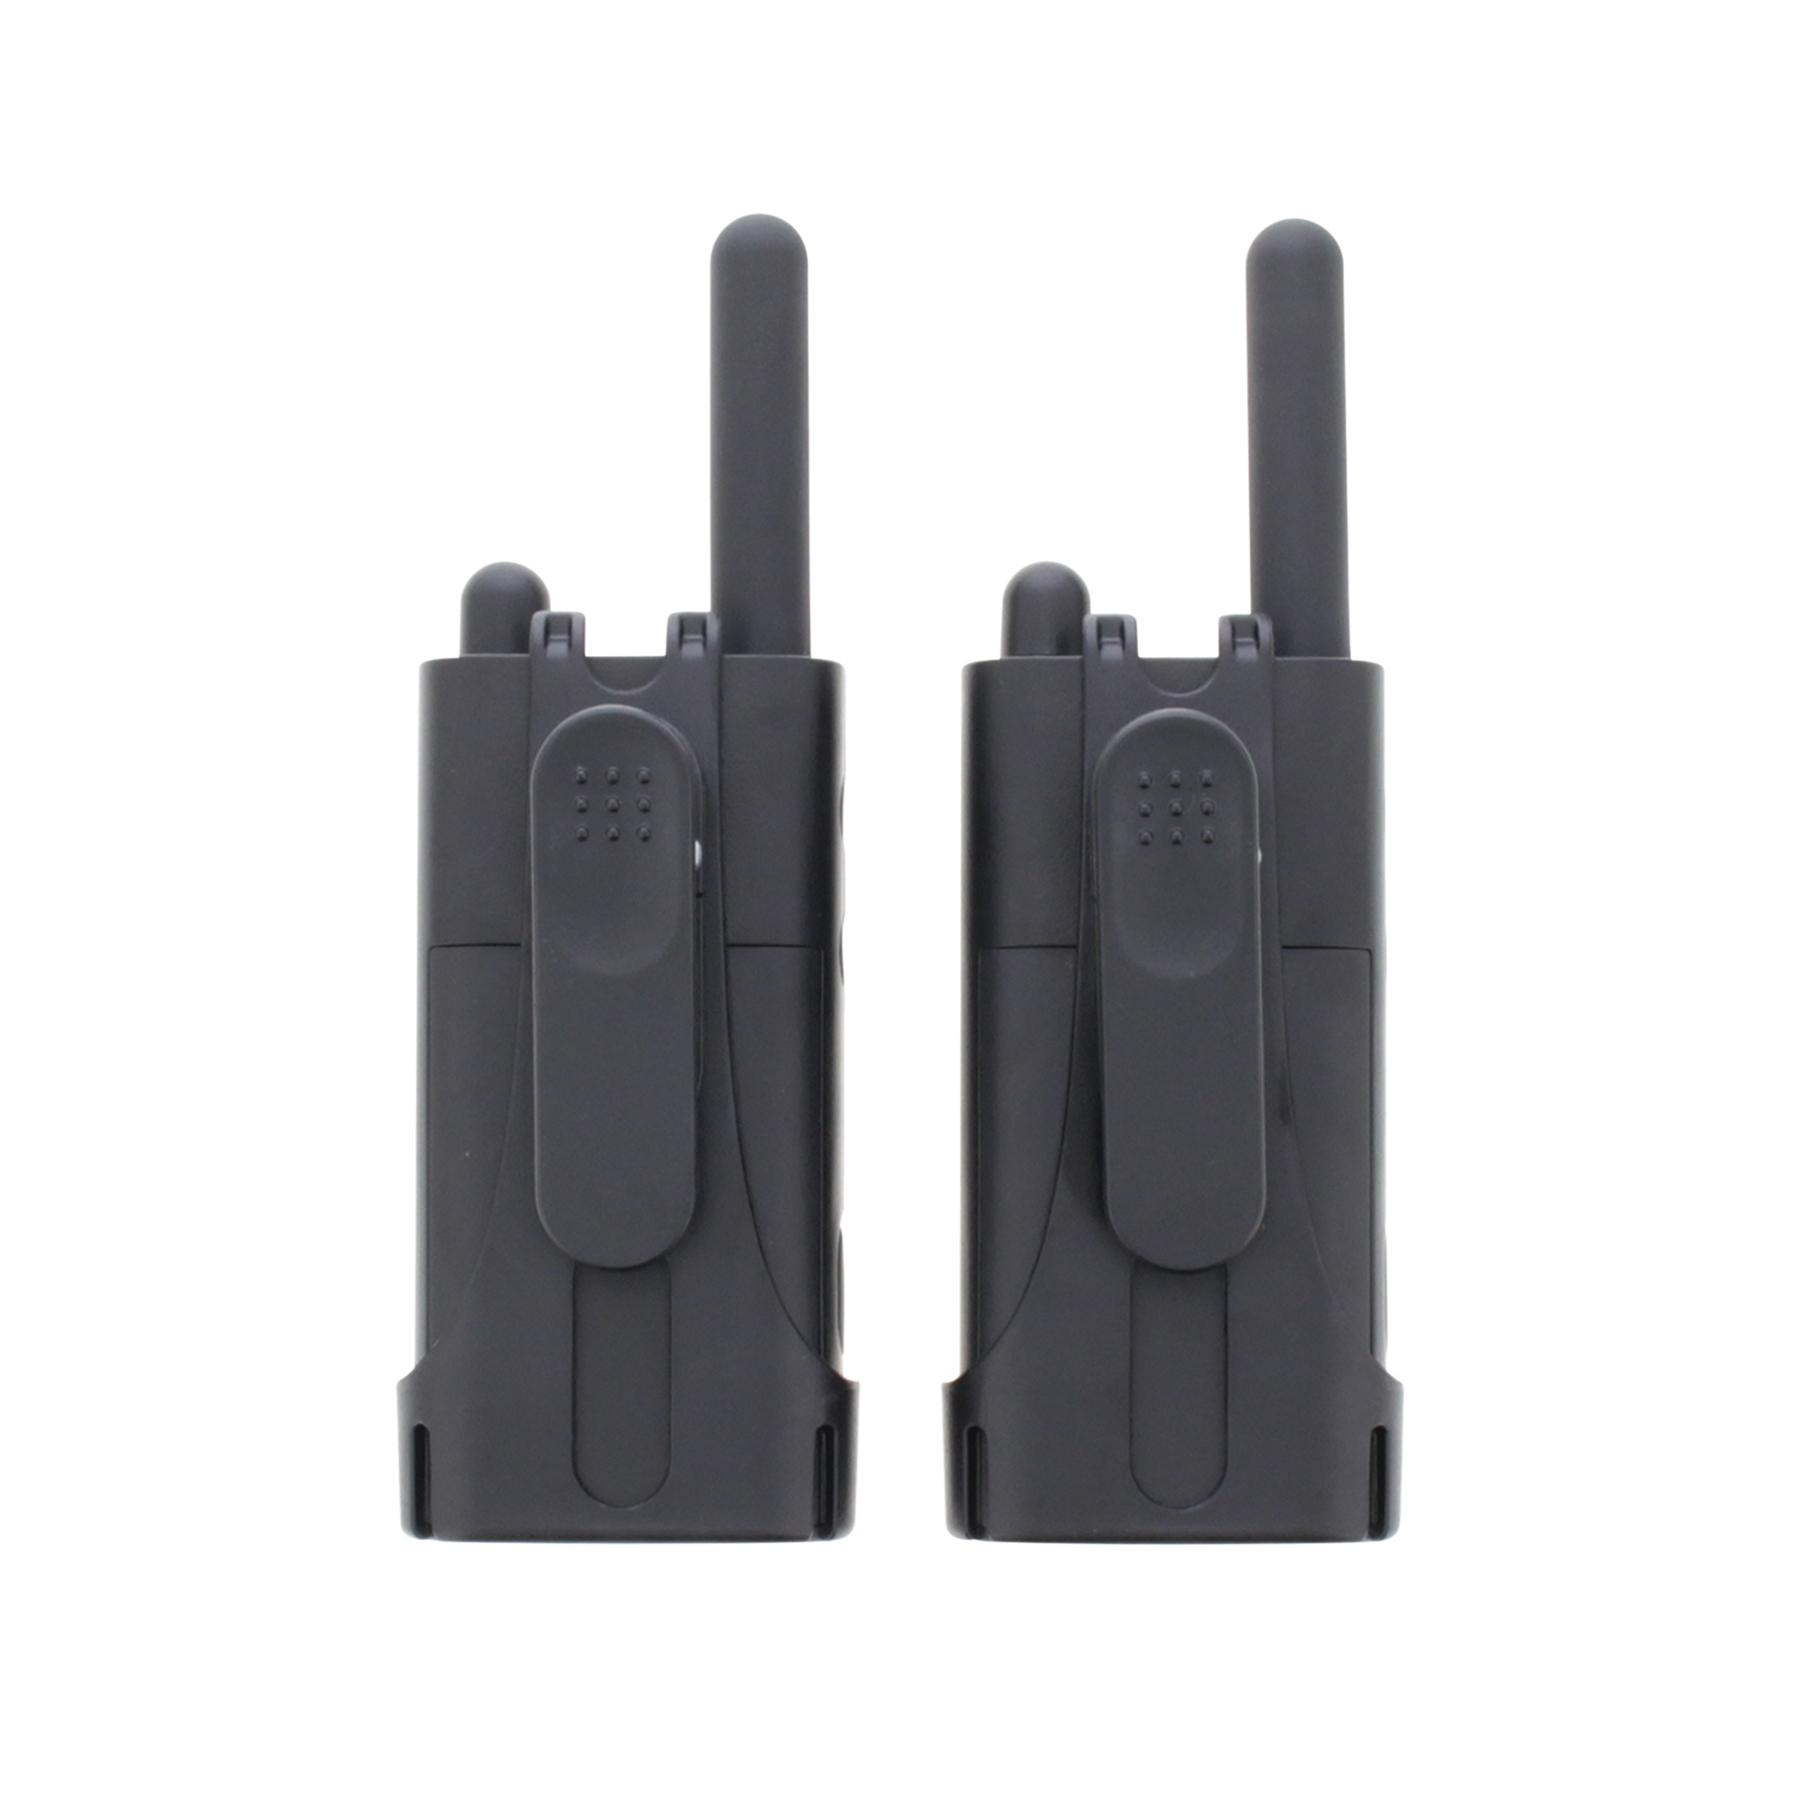 Cobra PU 500 Pro Business Two Way Radios 16 Preset Channels Range 8km Ref PU500B+SV-01 [Pair]